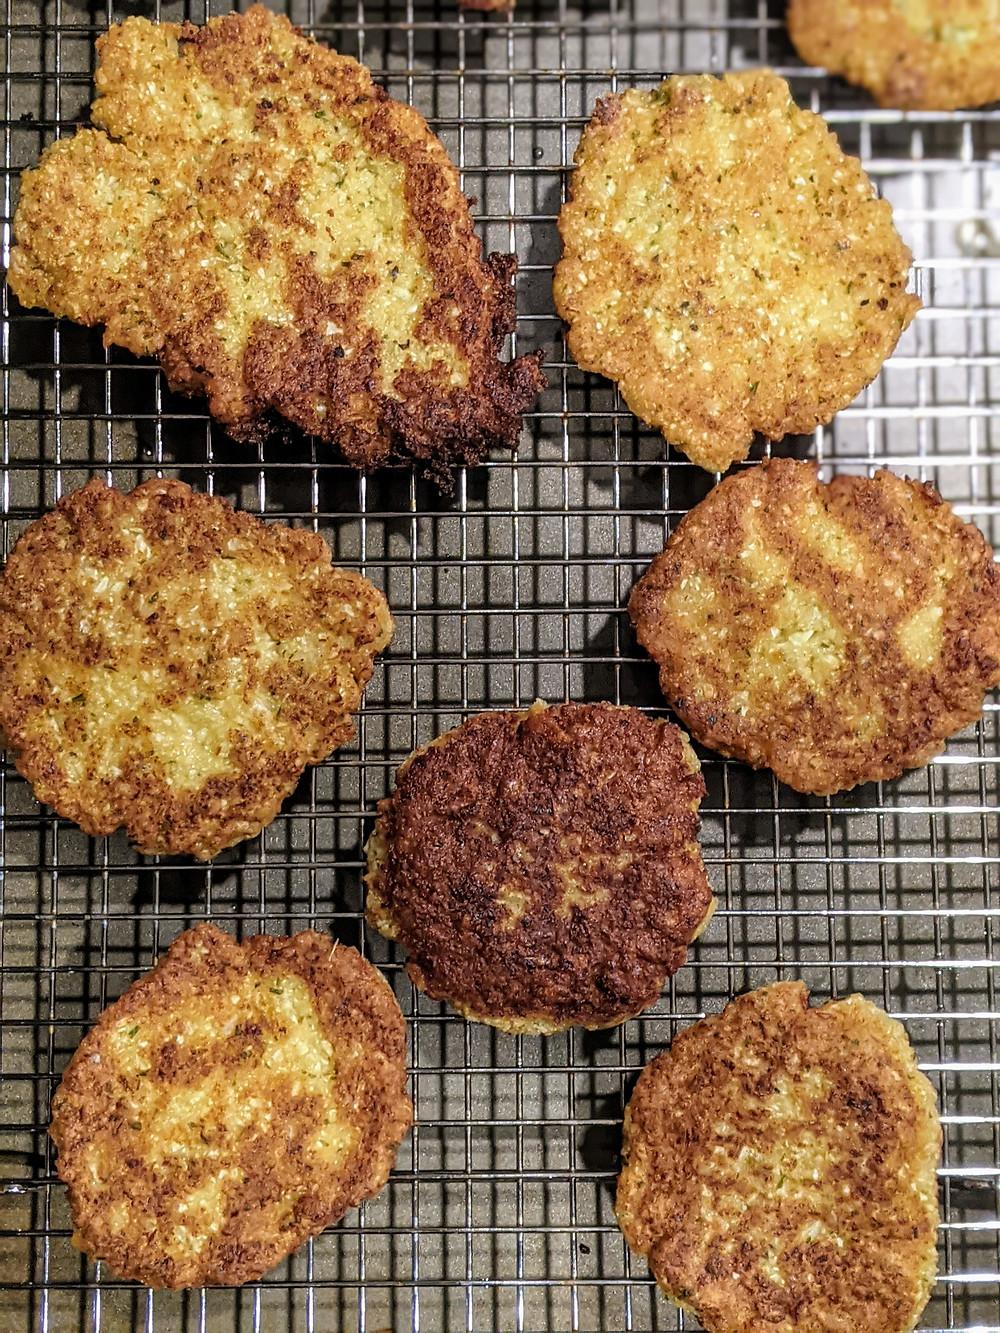 Gluten-Free and Vegan Cauliflower Hash Browns - amanda macgregor - joseph centineo - food allergy recipes